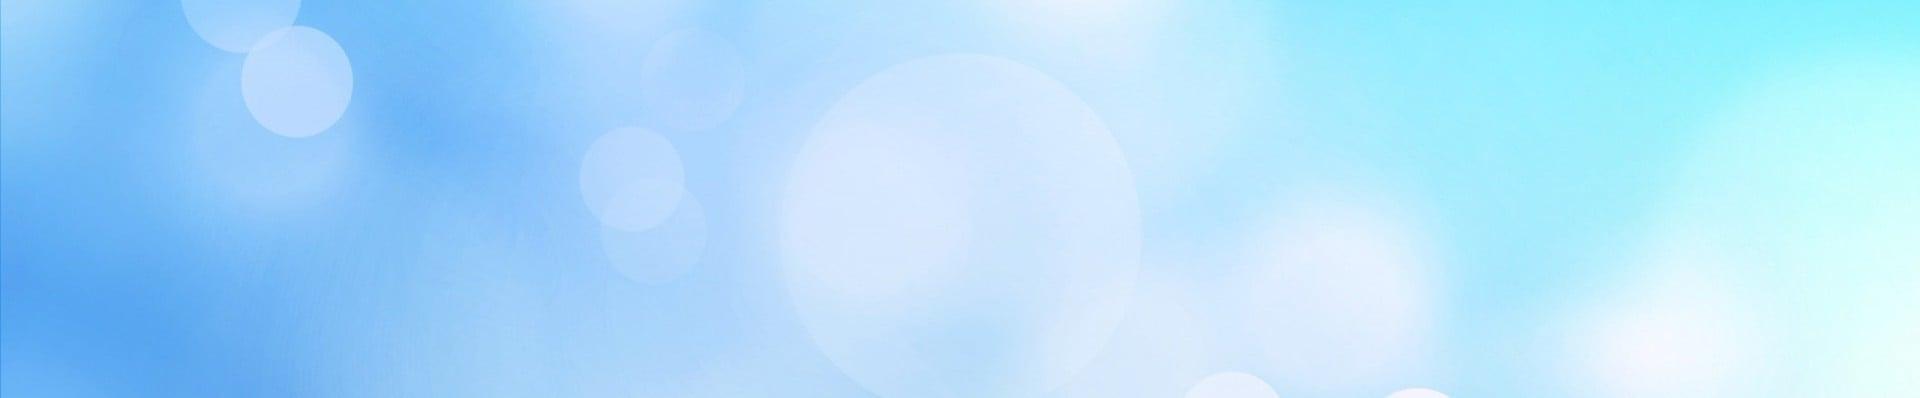 cropped-blue-2.jpg